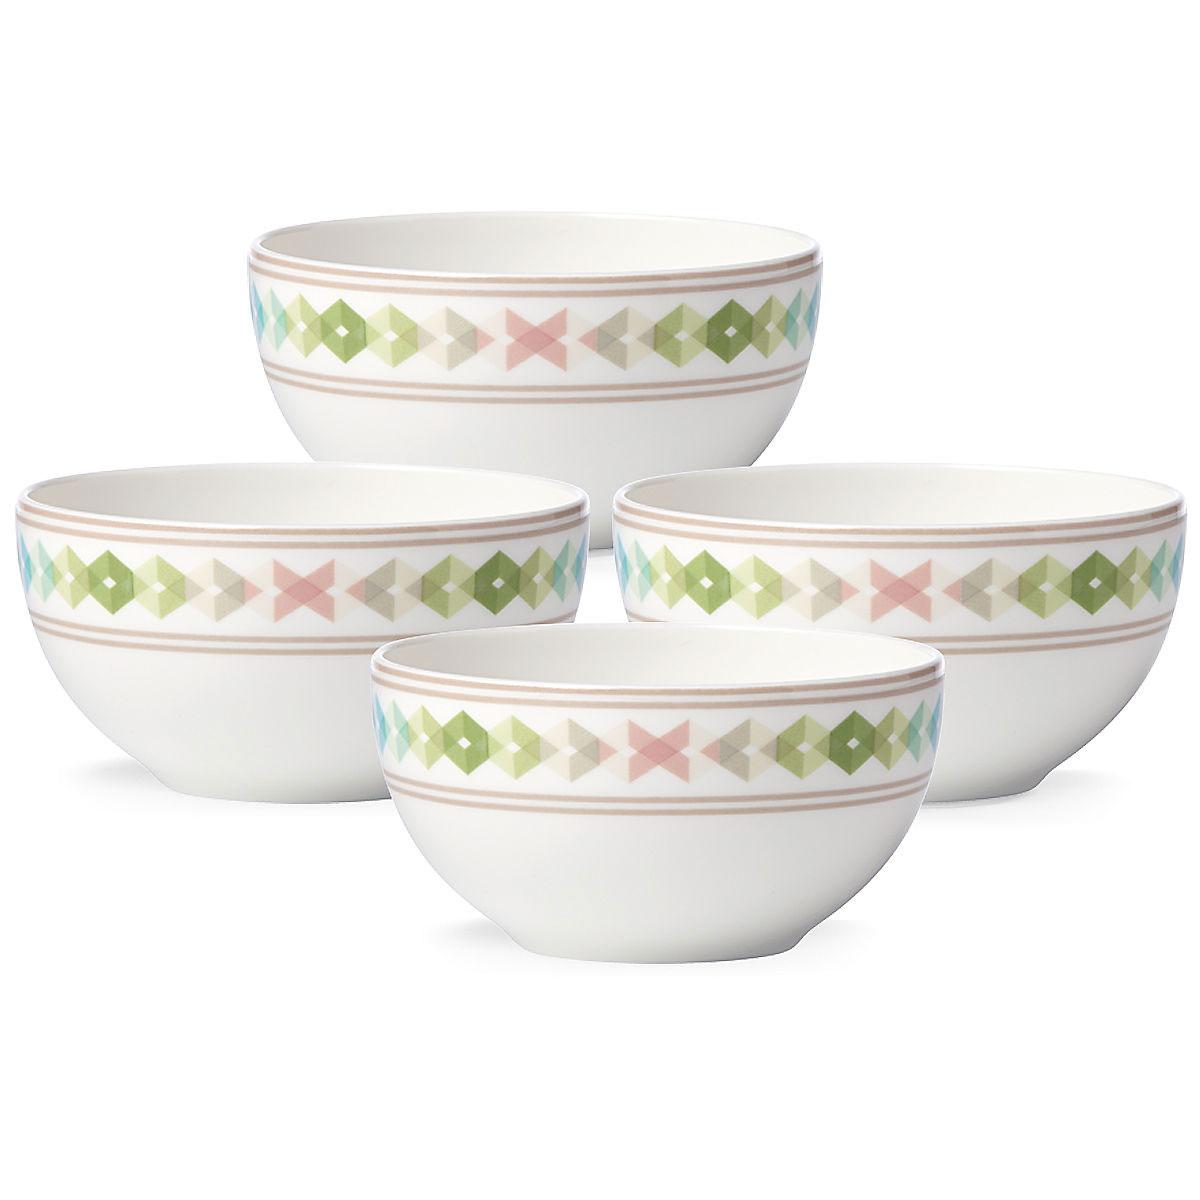 Lenox China Entertain 365 Sculpture Green and Blue Dessert Bowls, Set of 4